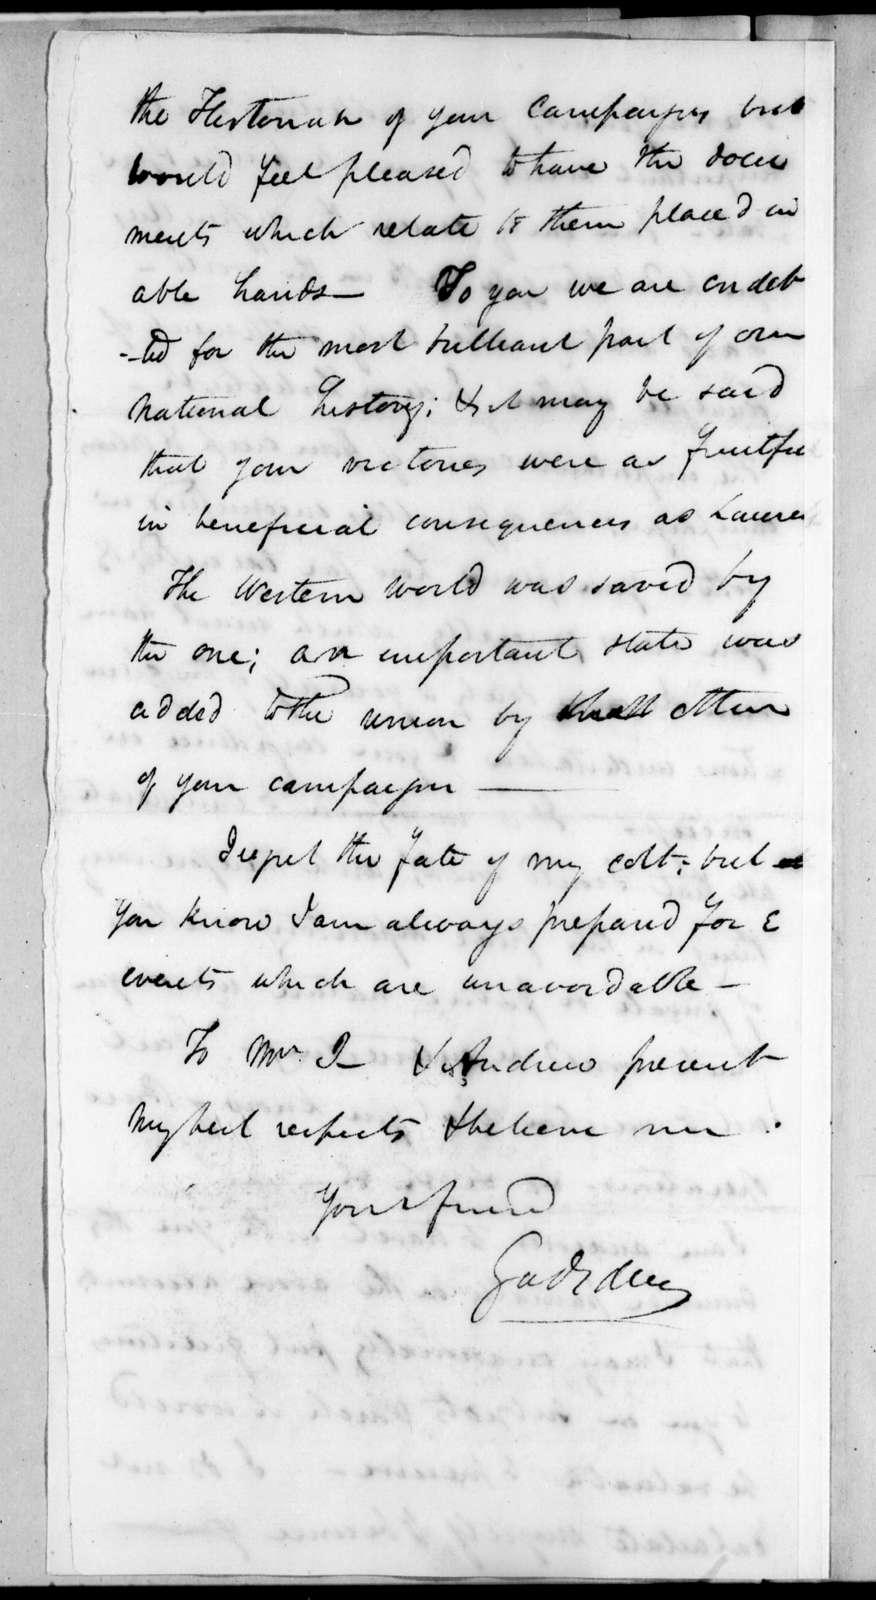 James Gadsden to Andrew Jackson, April 13, 1822